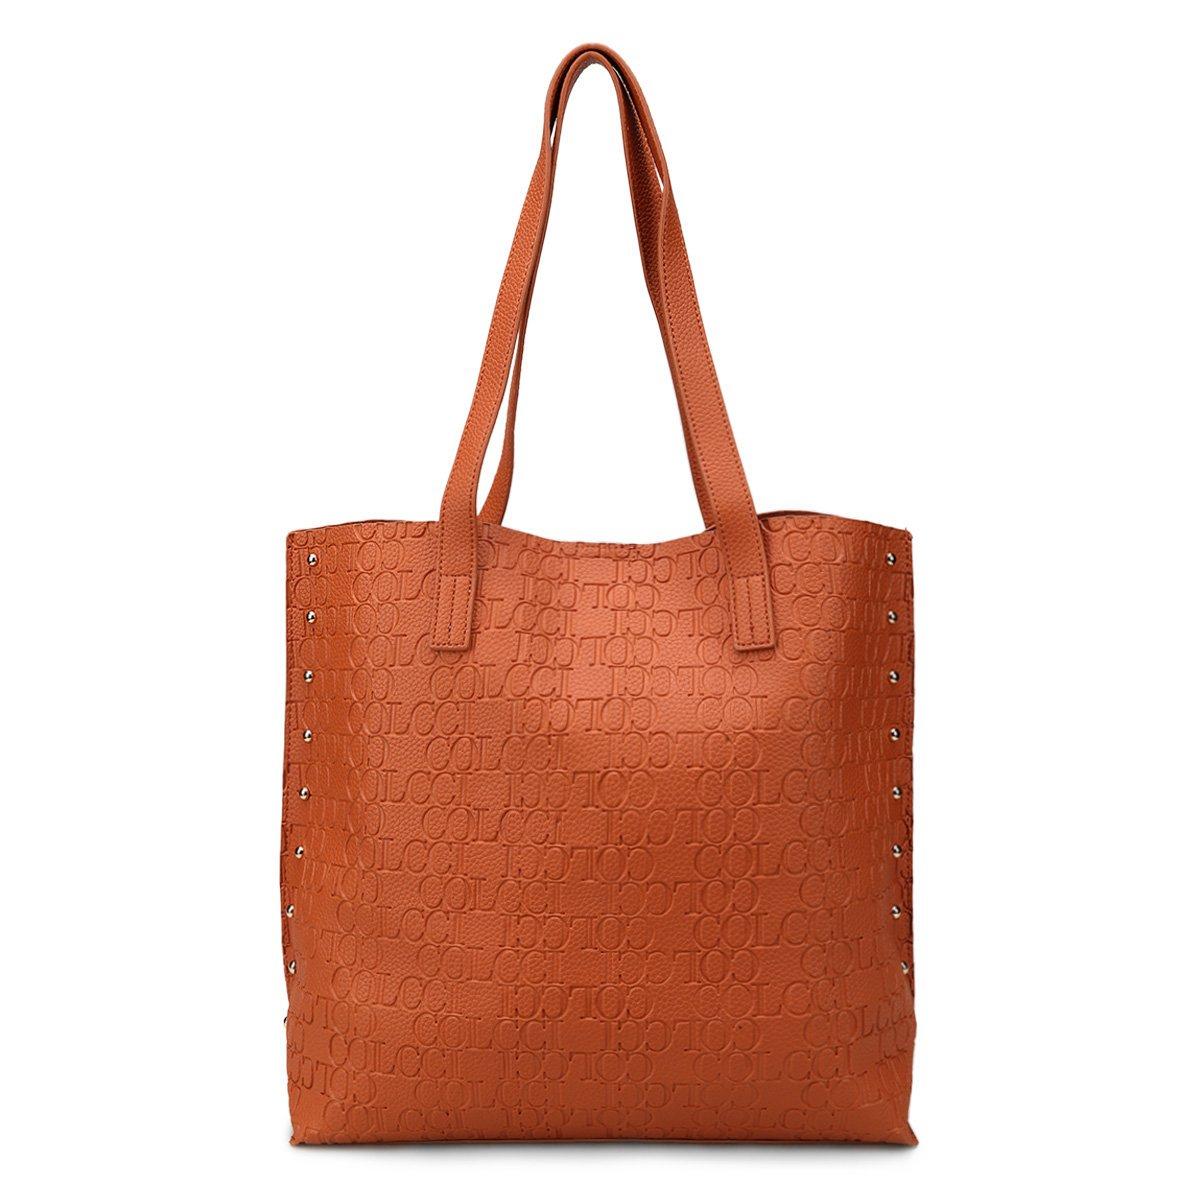 Bolsa Feminina Rusty : Bolsa carteira feminina colcci carteiras femininas